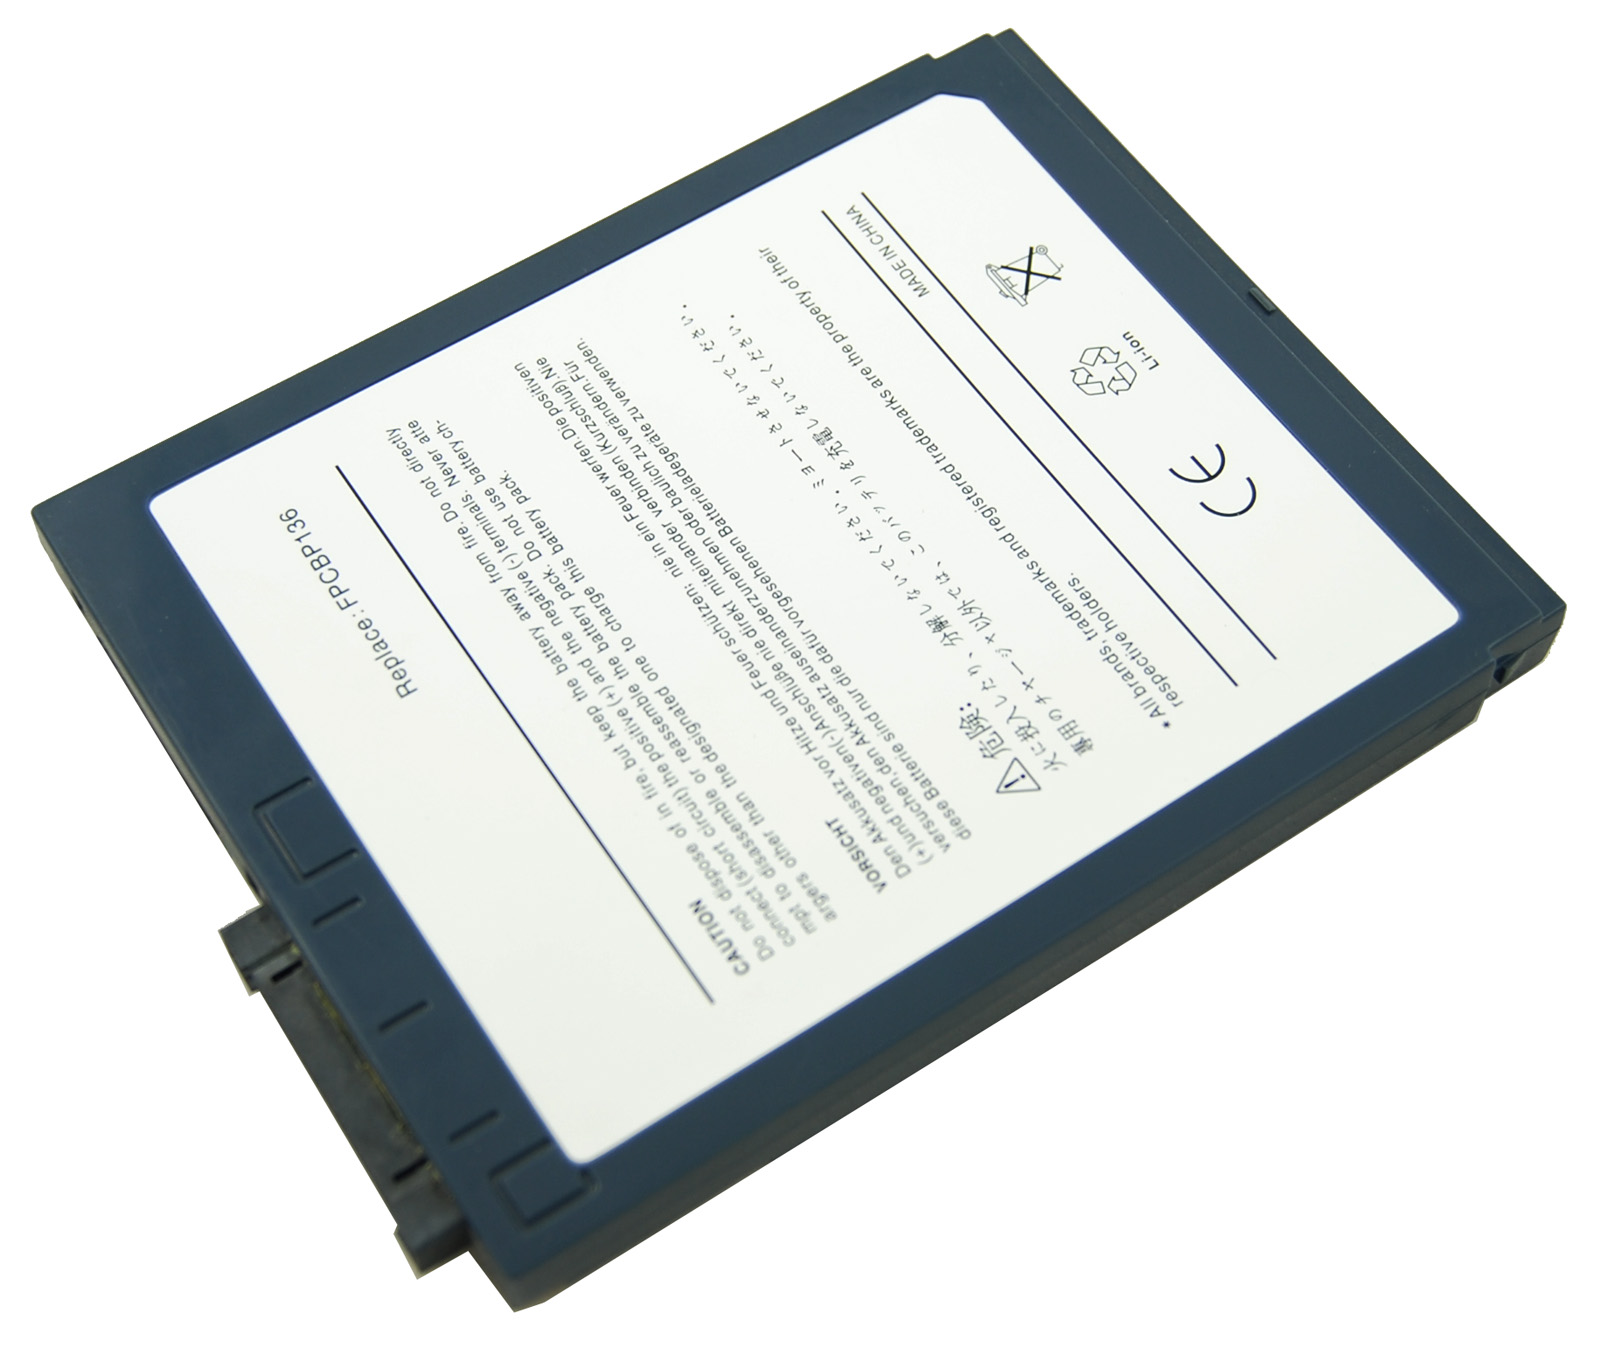 Fujitsu lifebook s2110